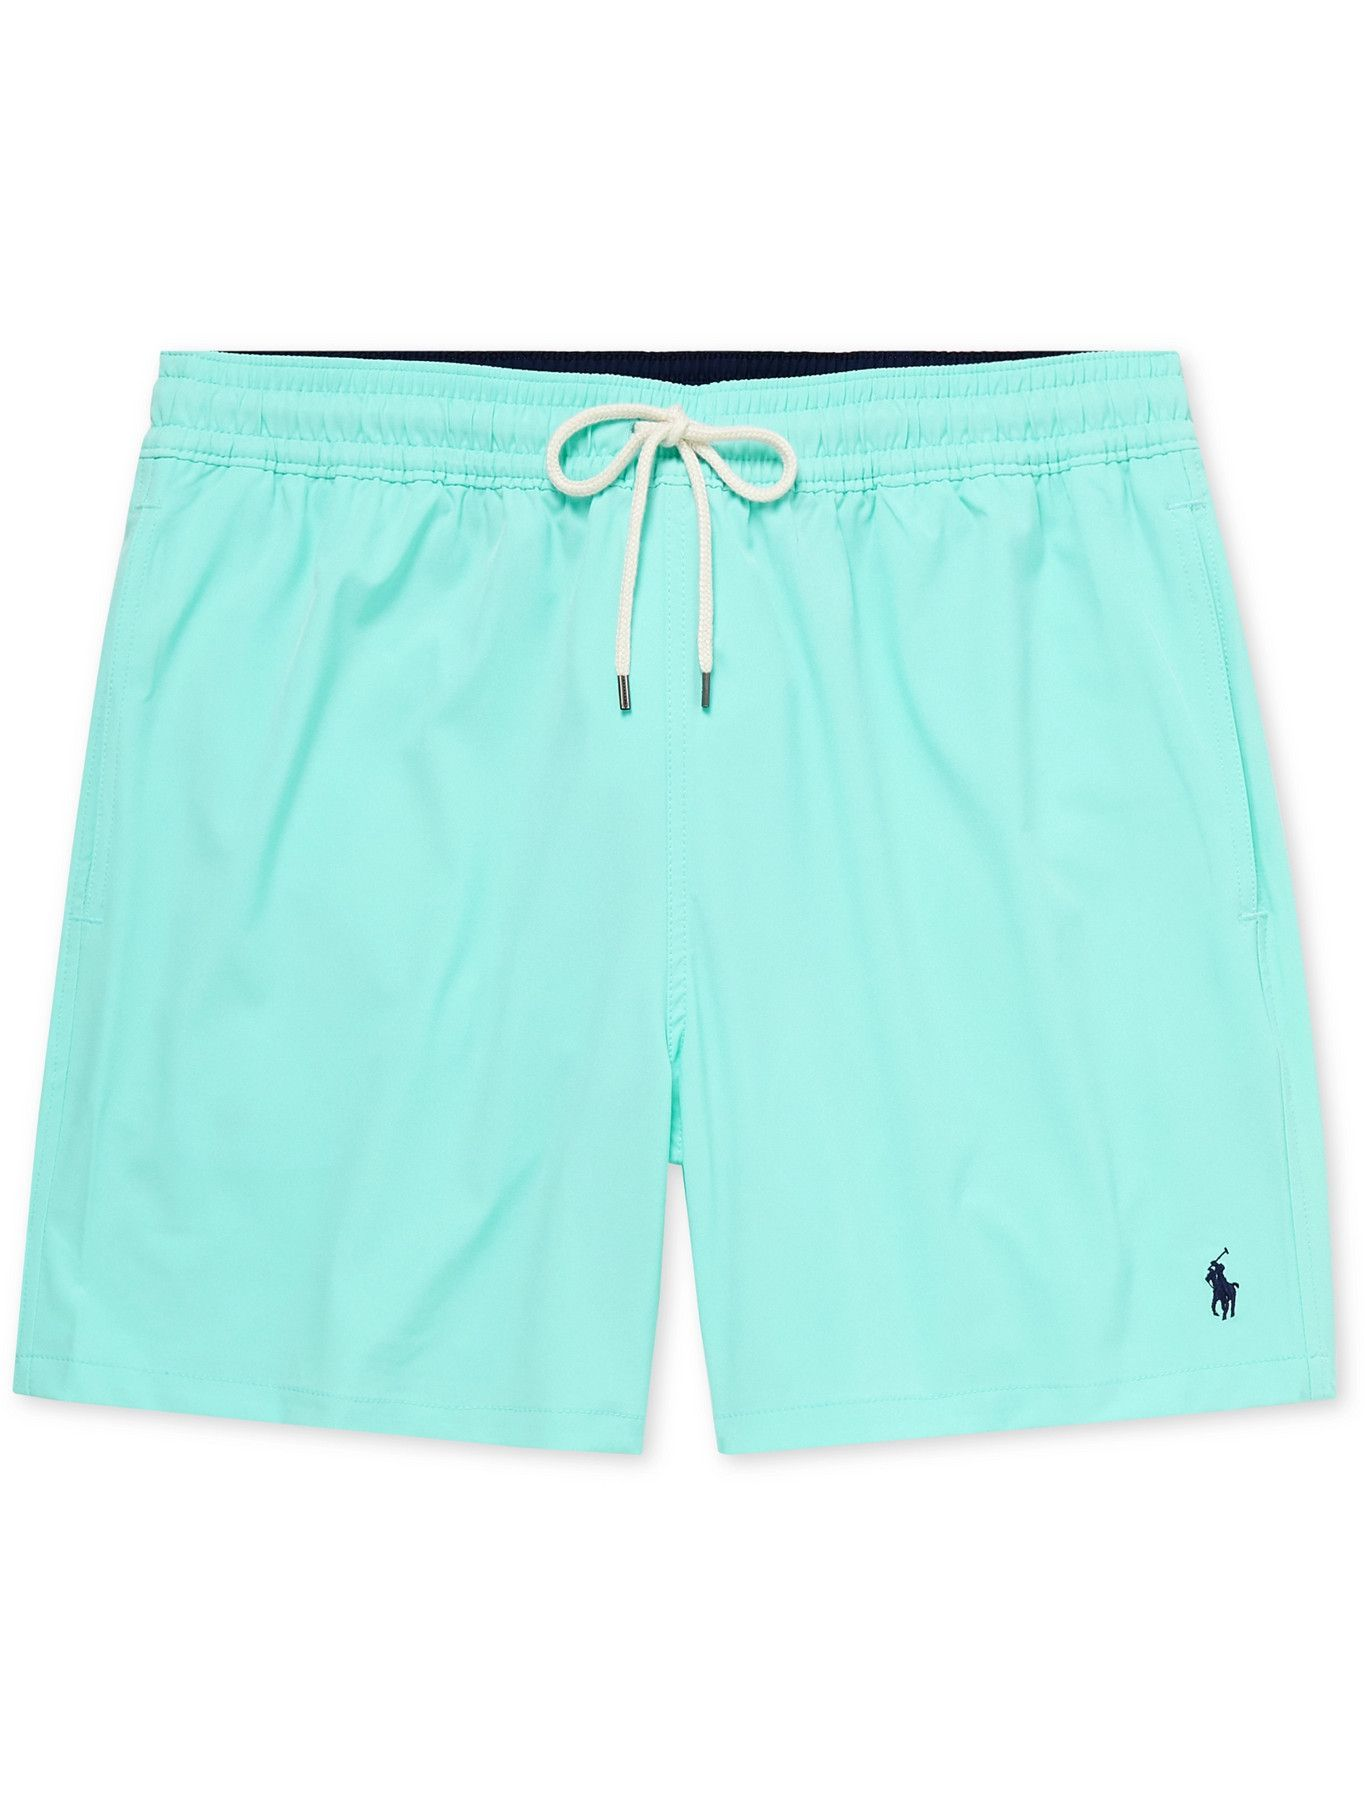 Photo: POLO RALPH LAUREN - Traveler Mid-Length Swim Shorts - Blue